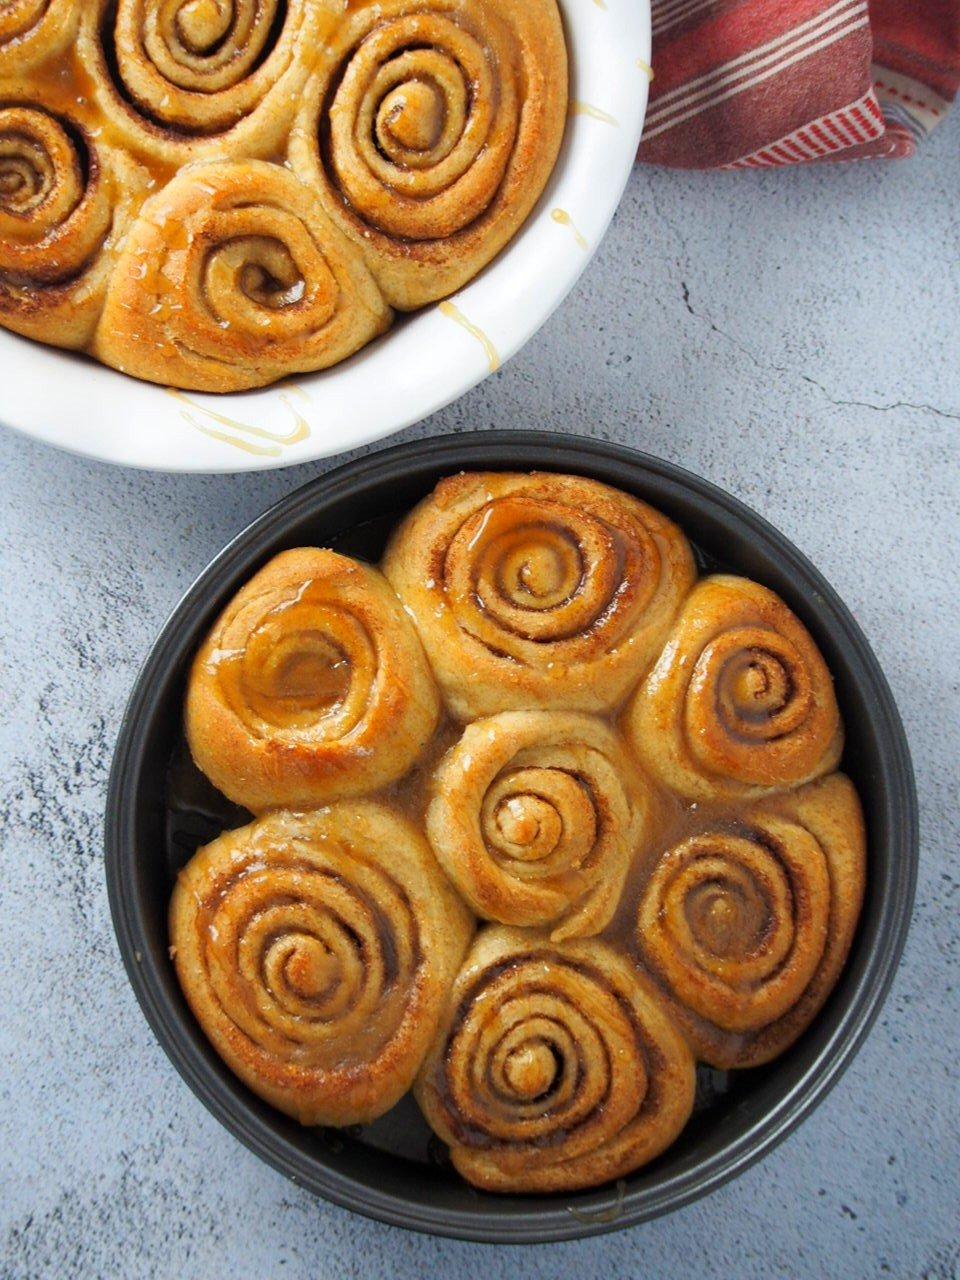 Cinnamon Rolls with caramel glaze freshly baked.